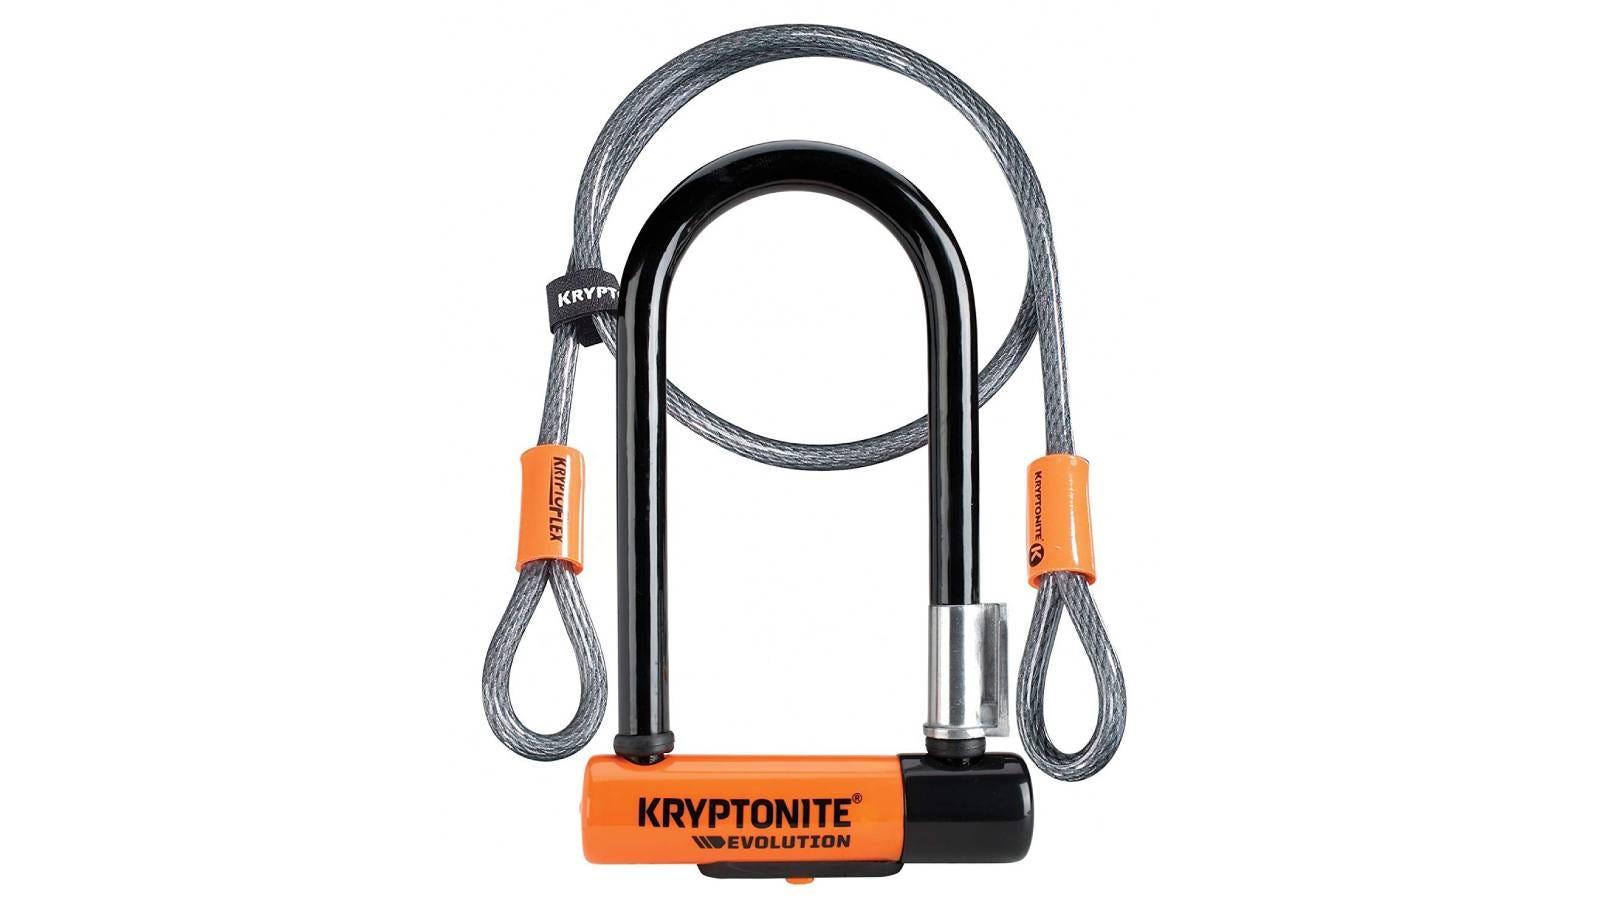 The Kryptonite Evolution 11-14mm U-Lock with FlexFrame-U Bracket.